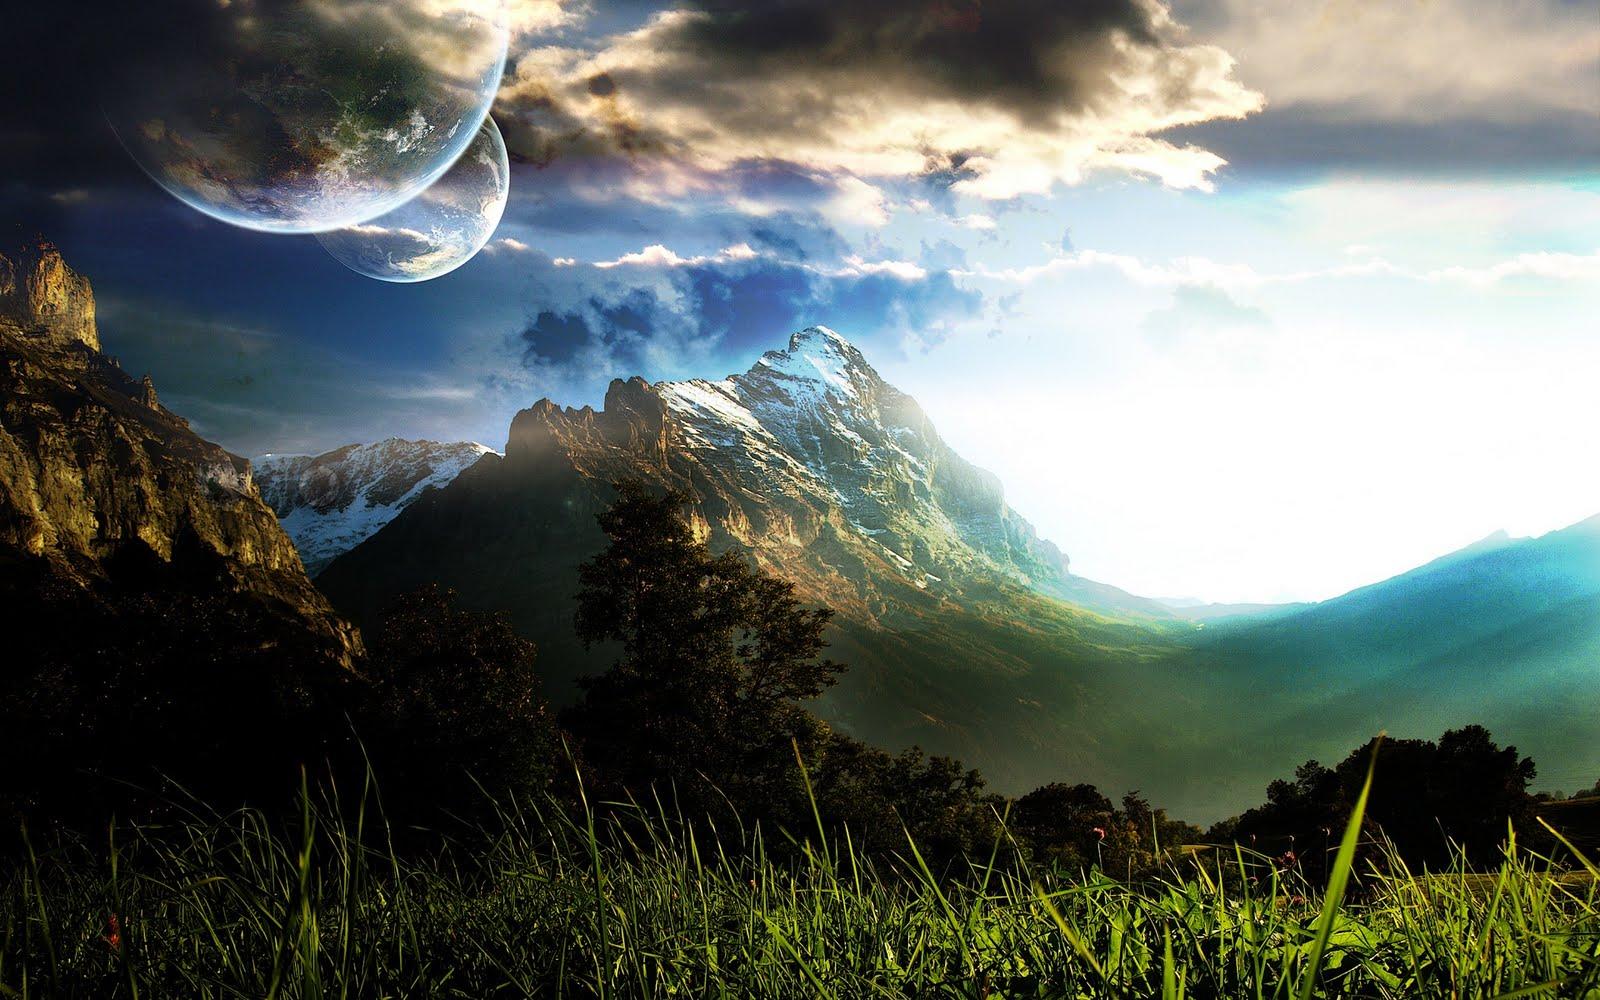 Amazing hq wallpaper fantasy hd wallpaper - Fantasy background ...